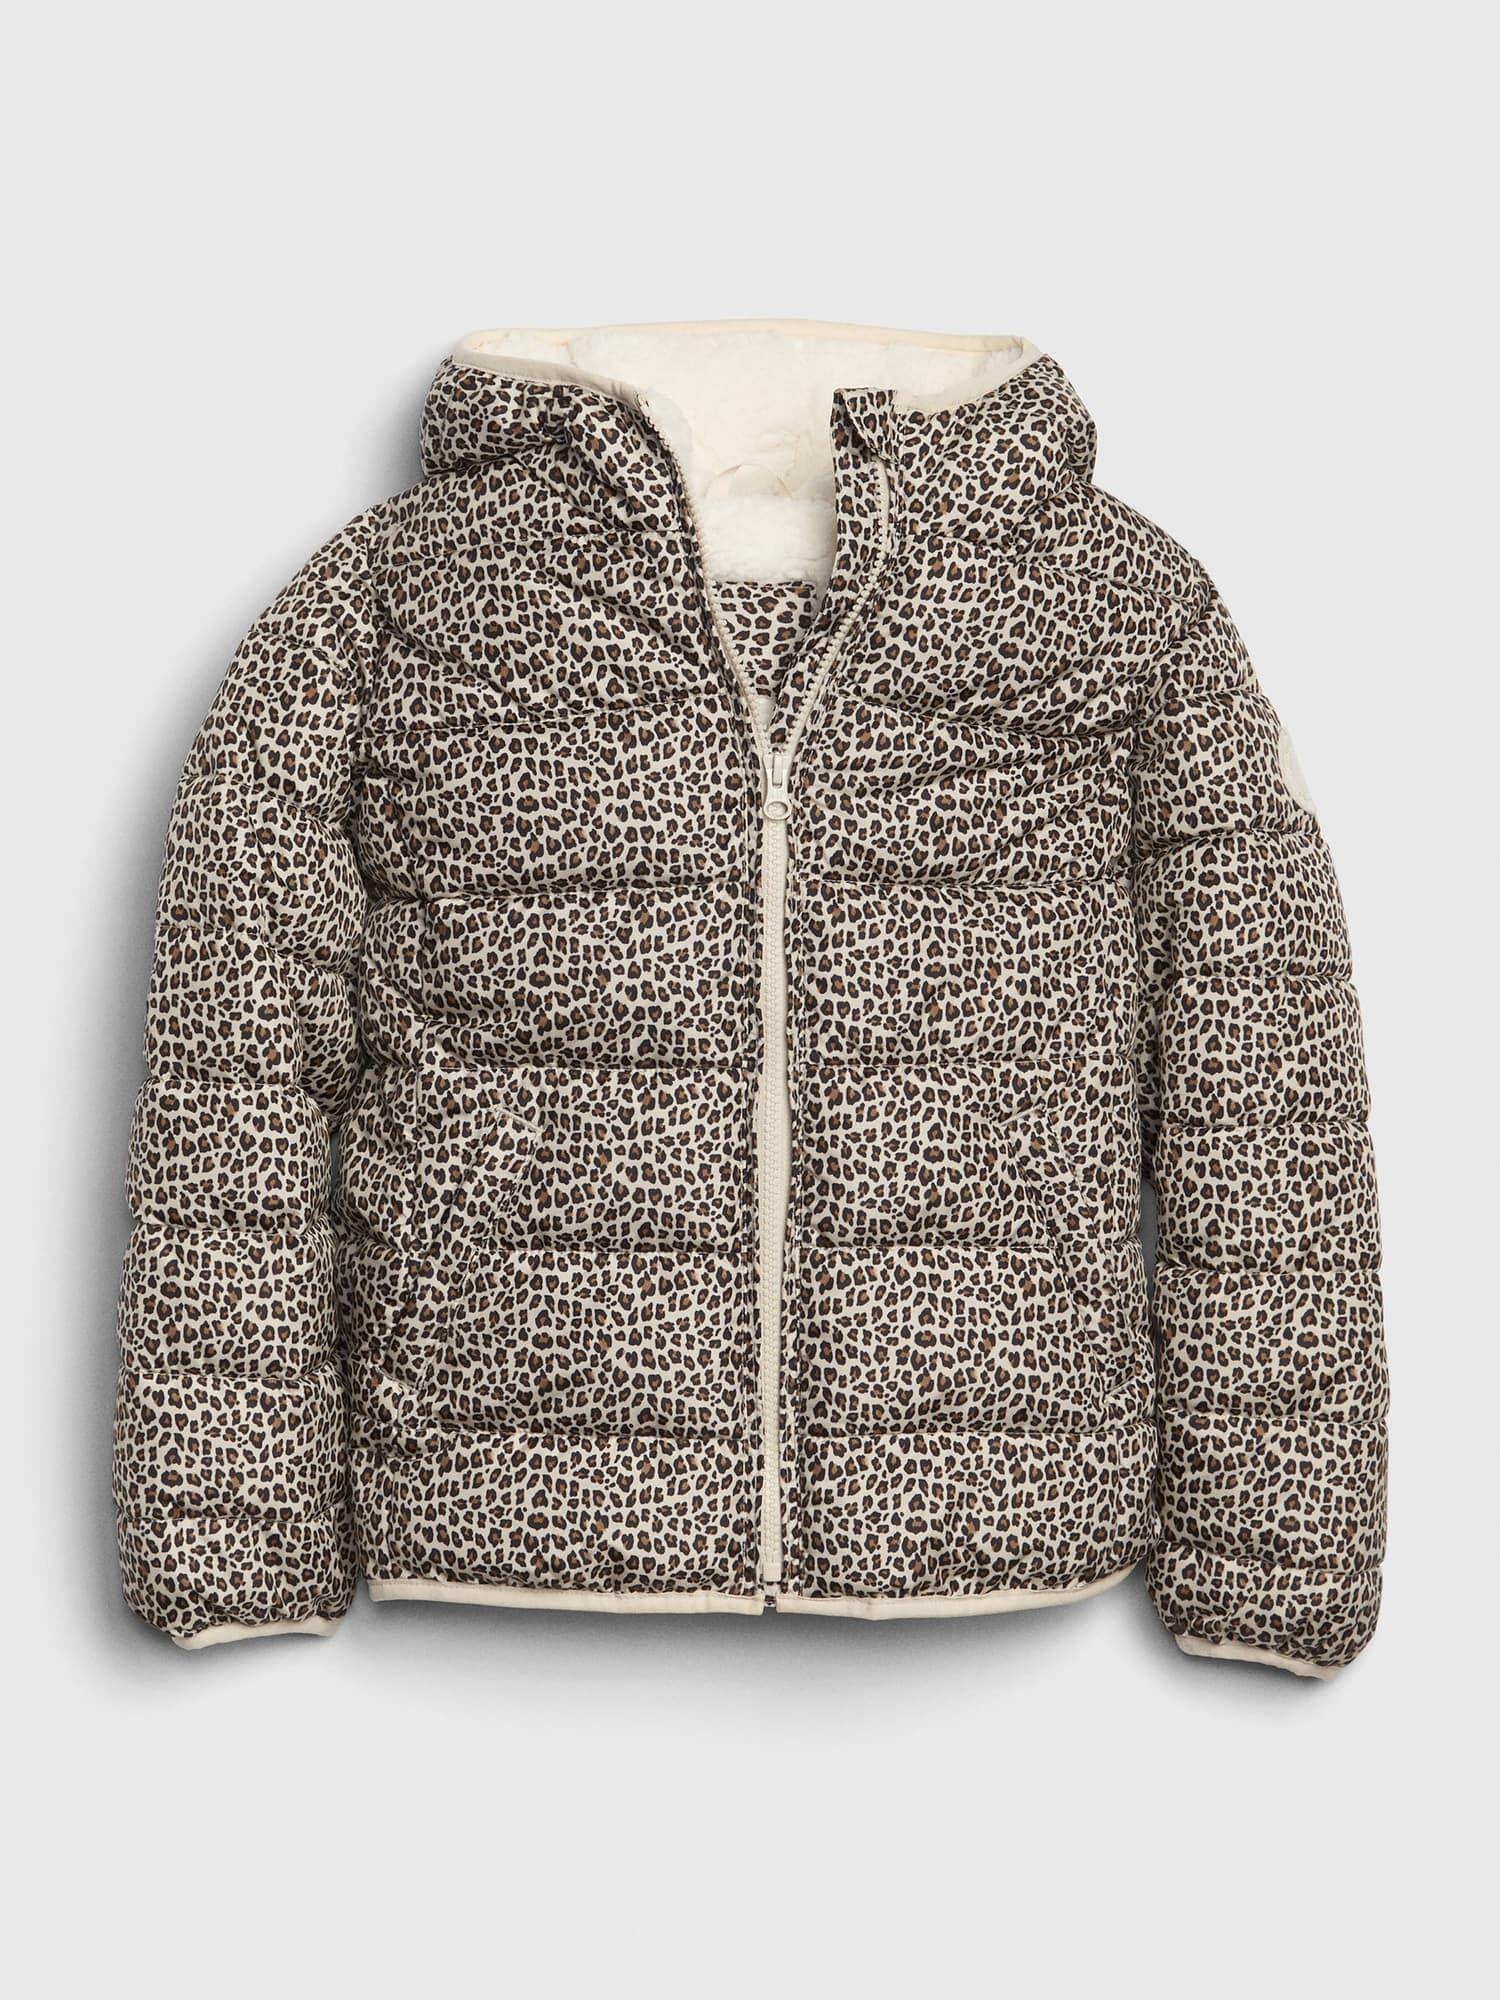 Kids Coldcontrol Max Puffer Gap Uk Girl Coat Kids Outfits Moto Jacket Style [ 2000 x 1500 Pixel ]